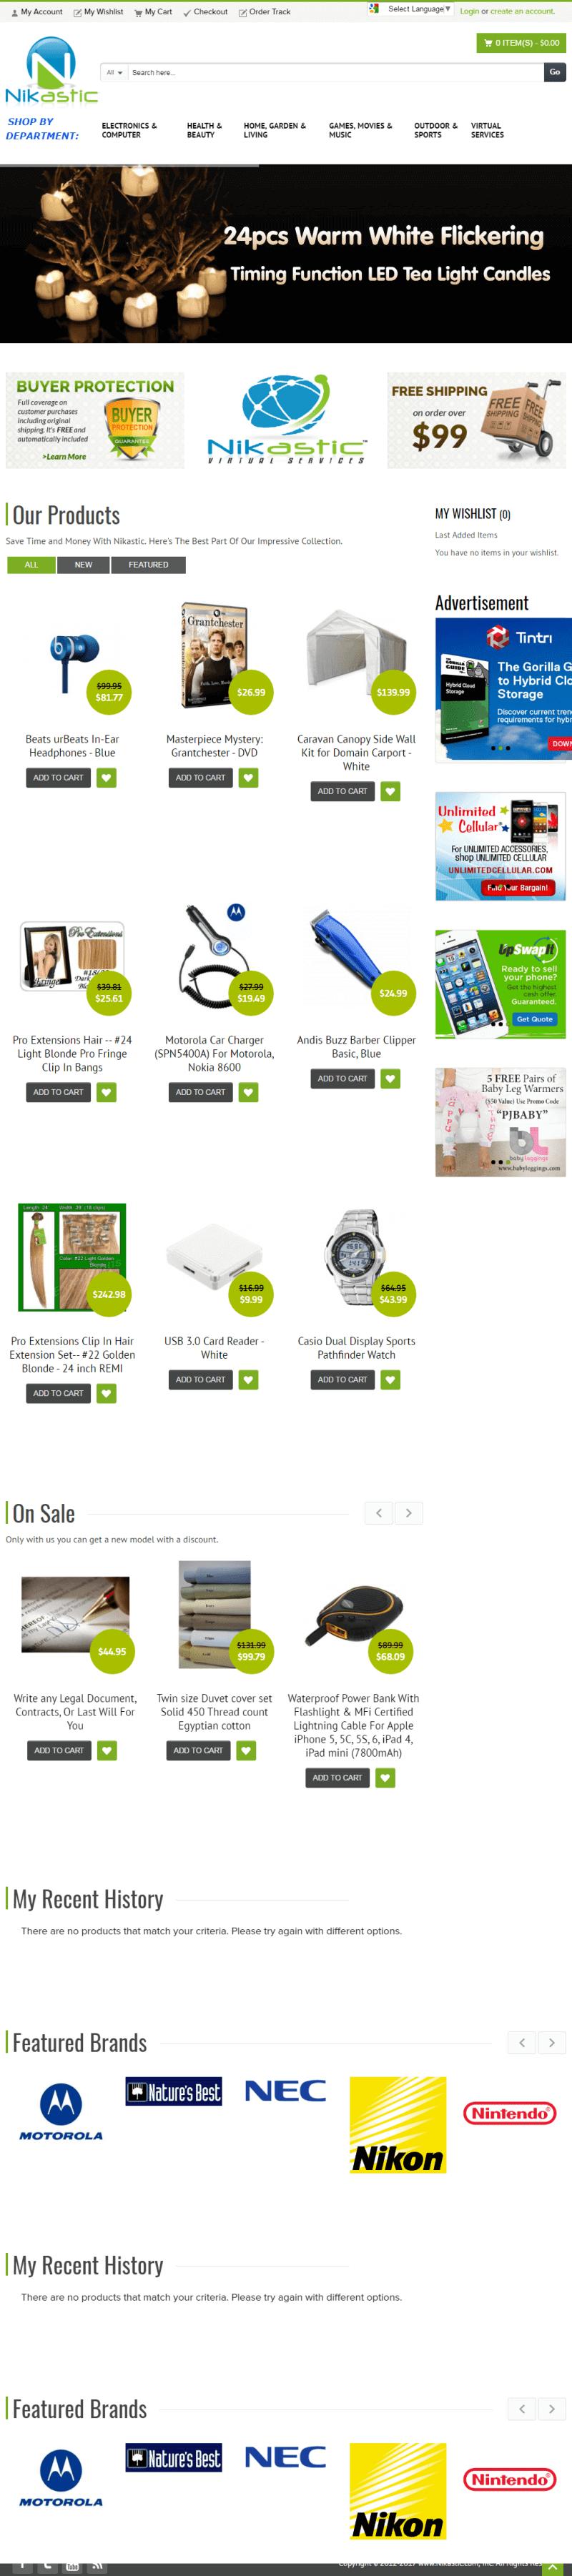 Nikastic Internet Shopping Innovation At Its Finest-min (2)